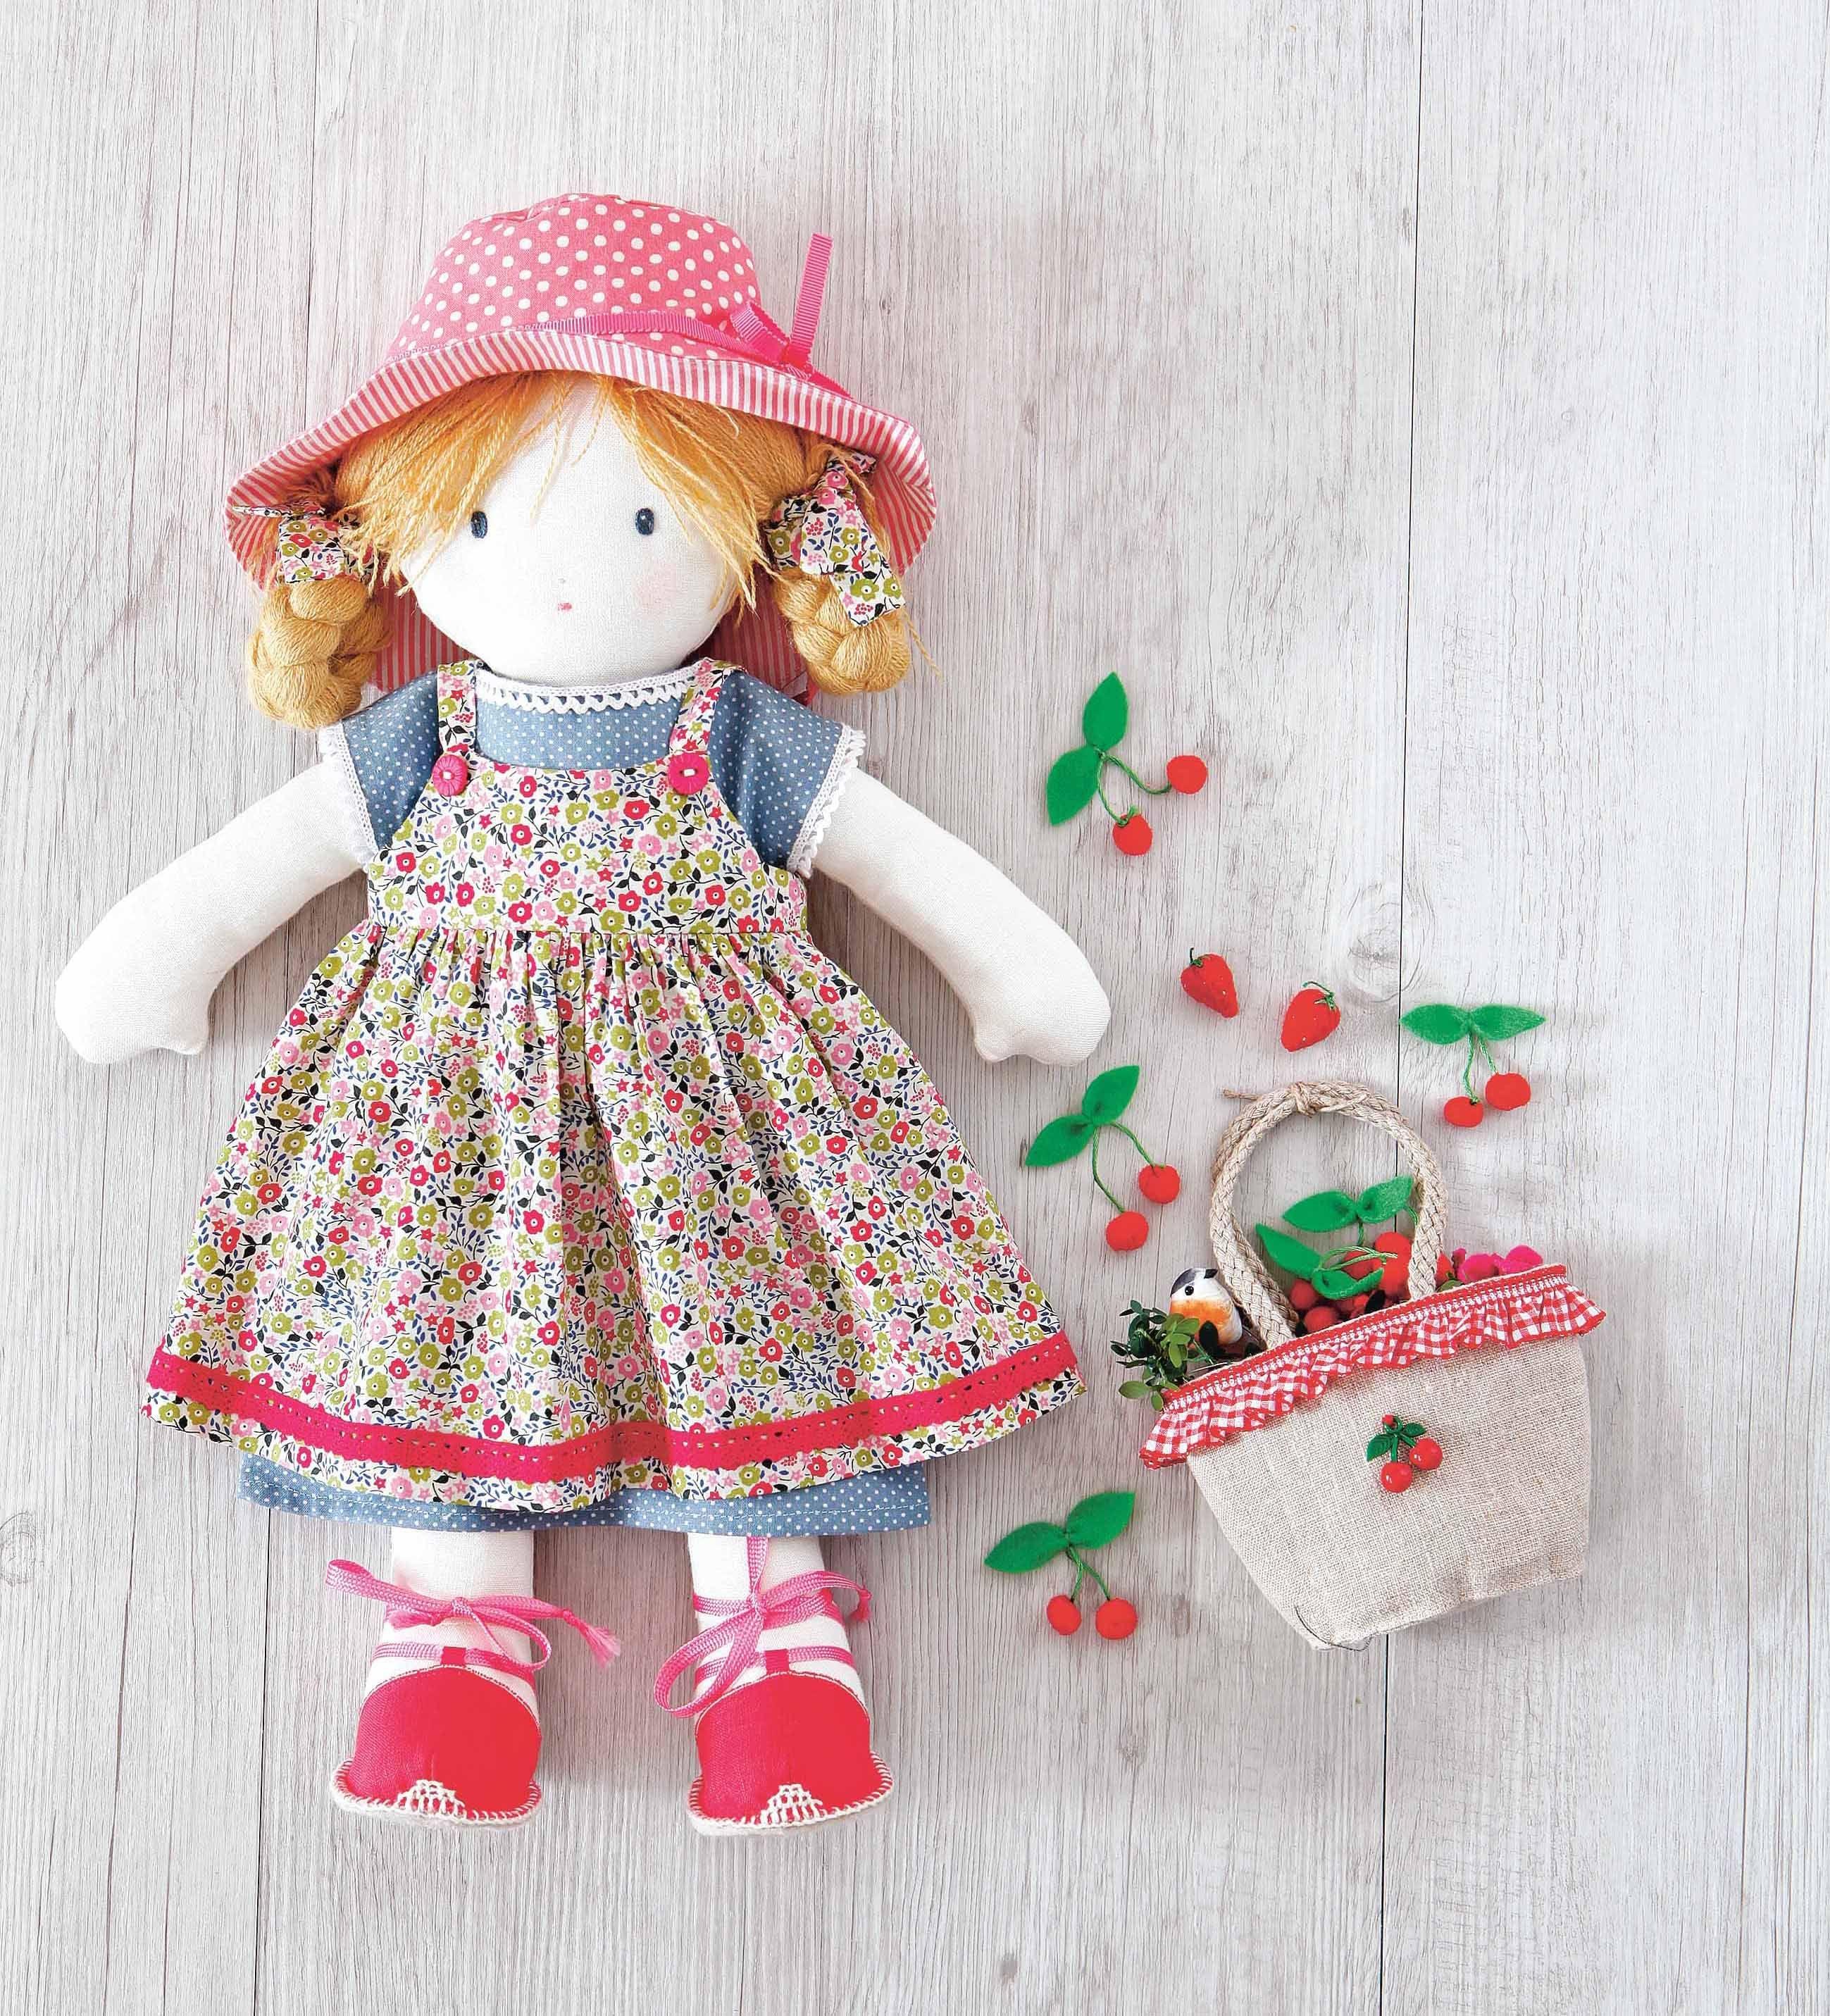 Pattern: Printable Rag Doll Sewing Pattern   Sewing   Doll Sewing - Free Printable Rag Doll Patterns